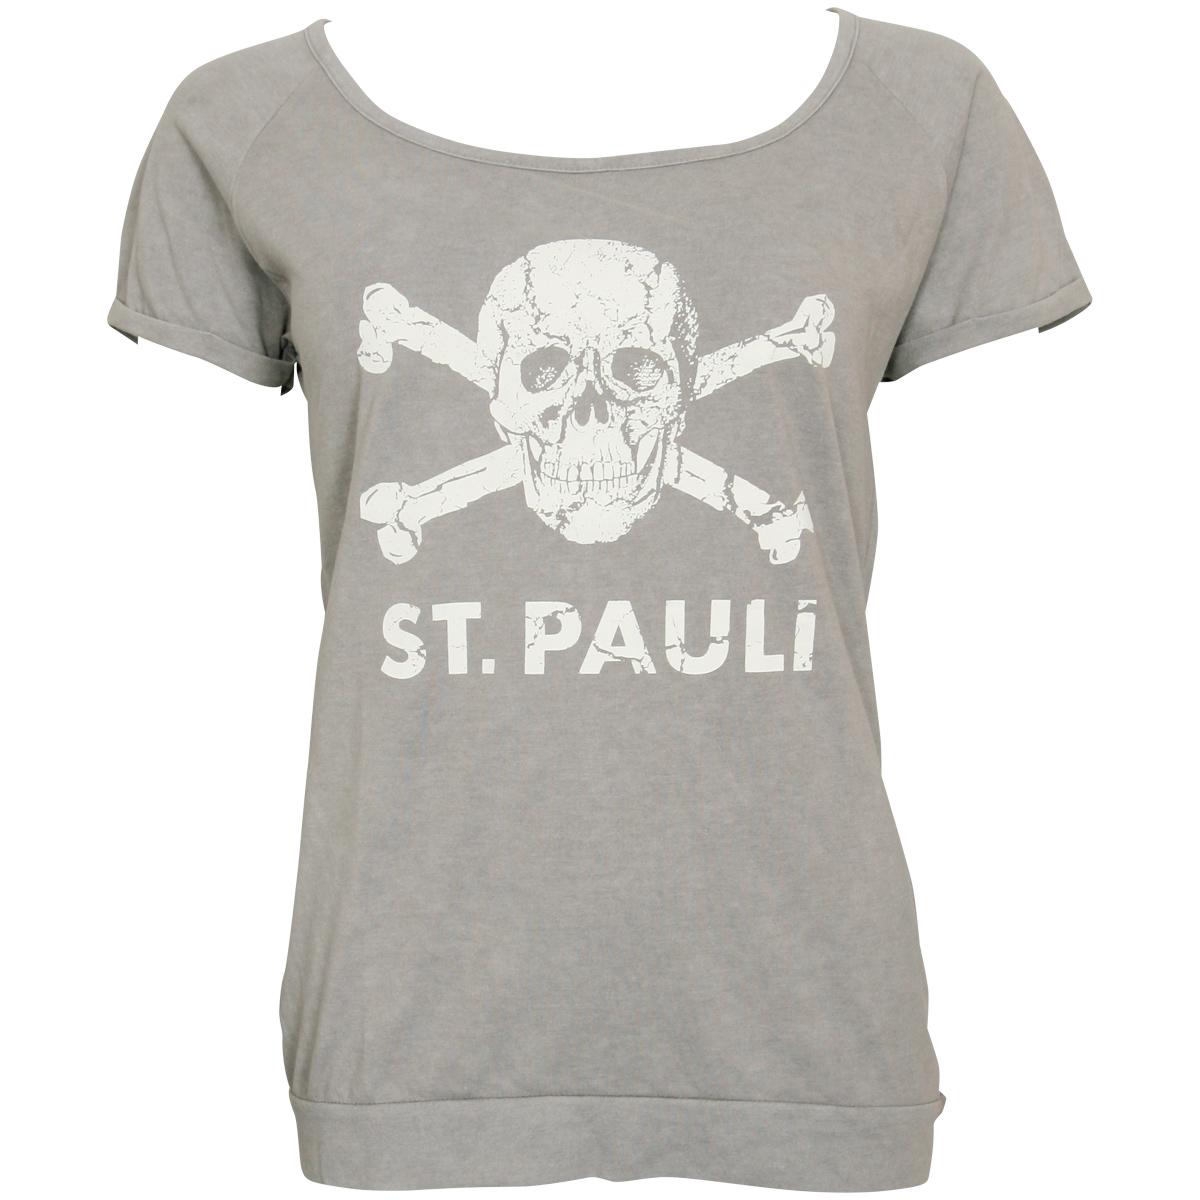 FC St. Pauli - Damen T-Shirt Brushed Grey mit Totenkopf - grau